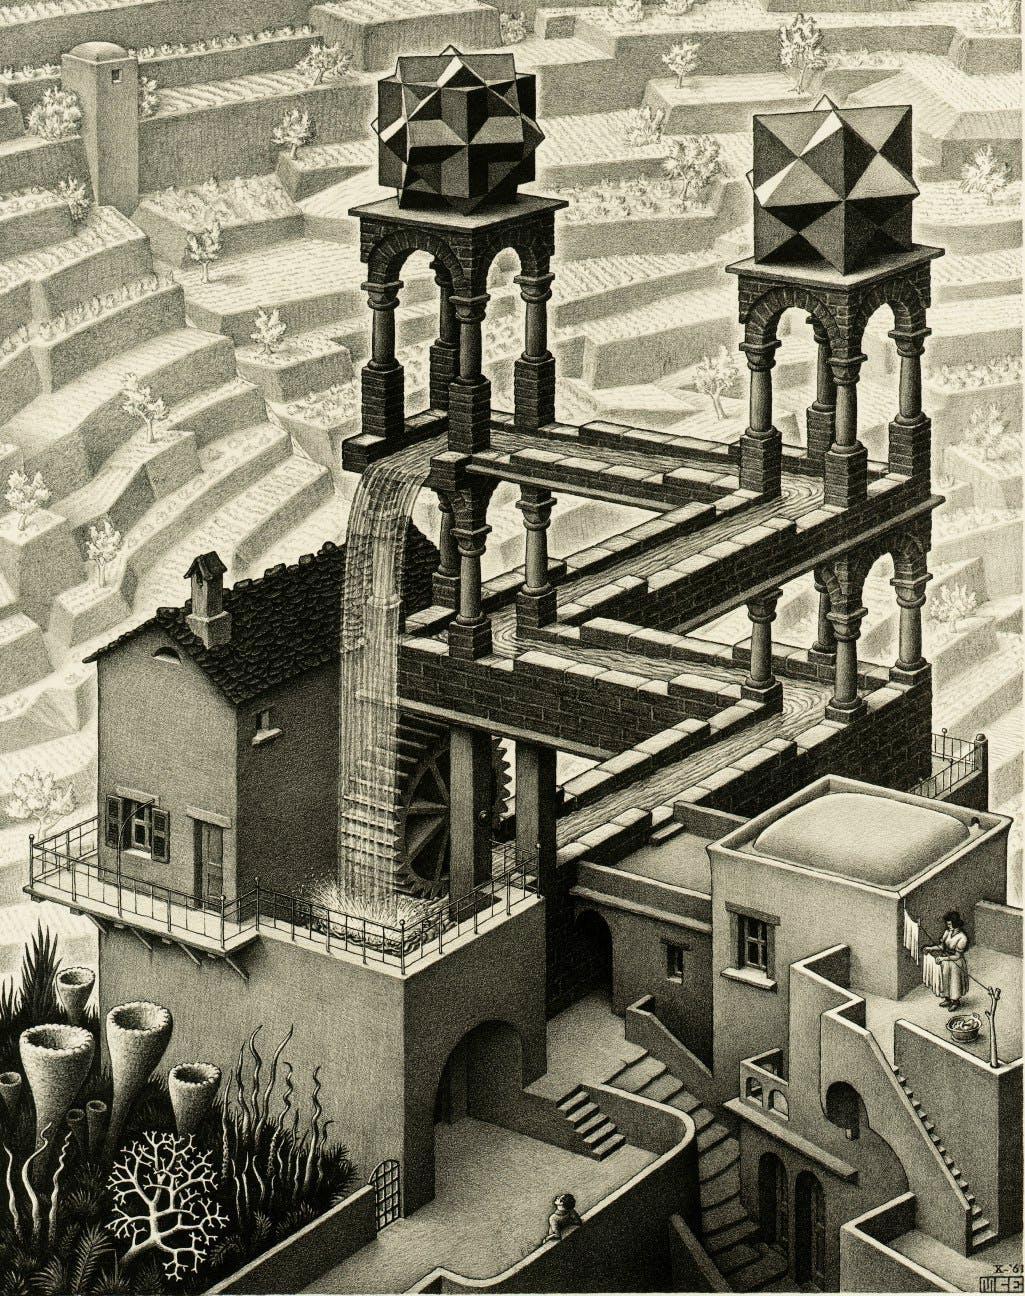 1961, Maurits Cornelis Escher